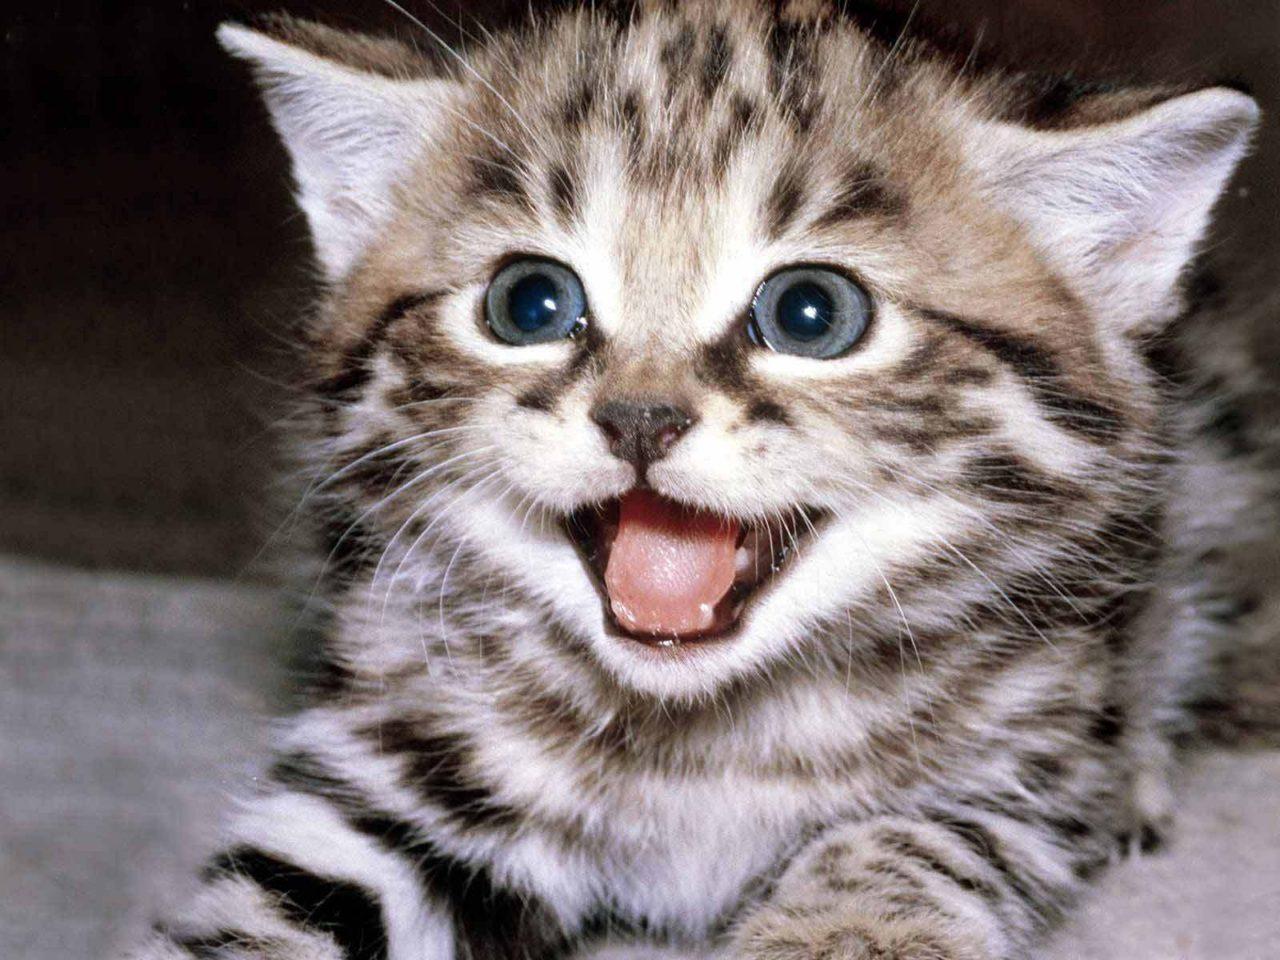 Cute-kittens-12929201-1600-1200__2_.jpg